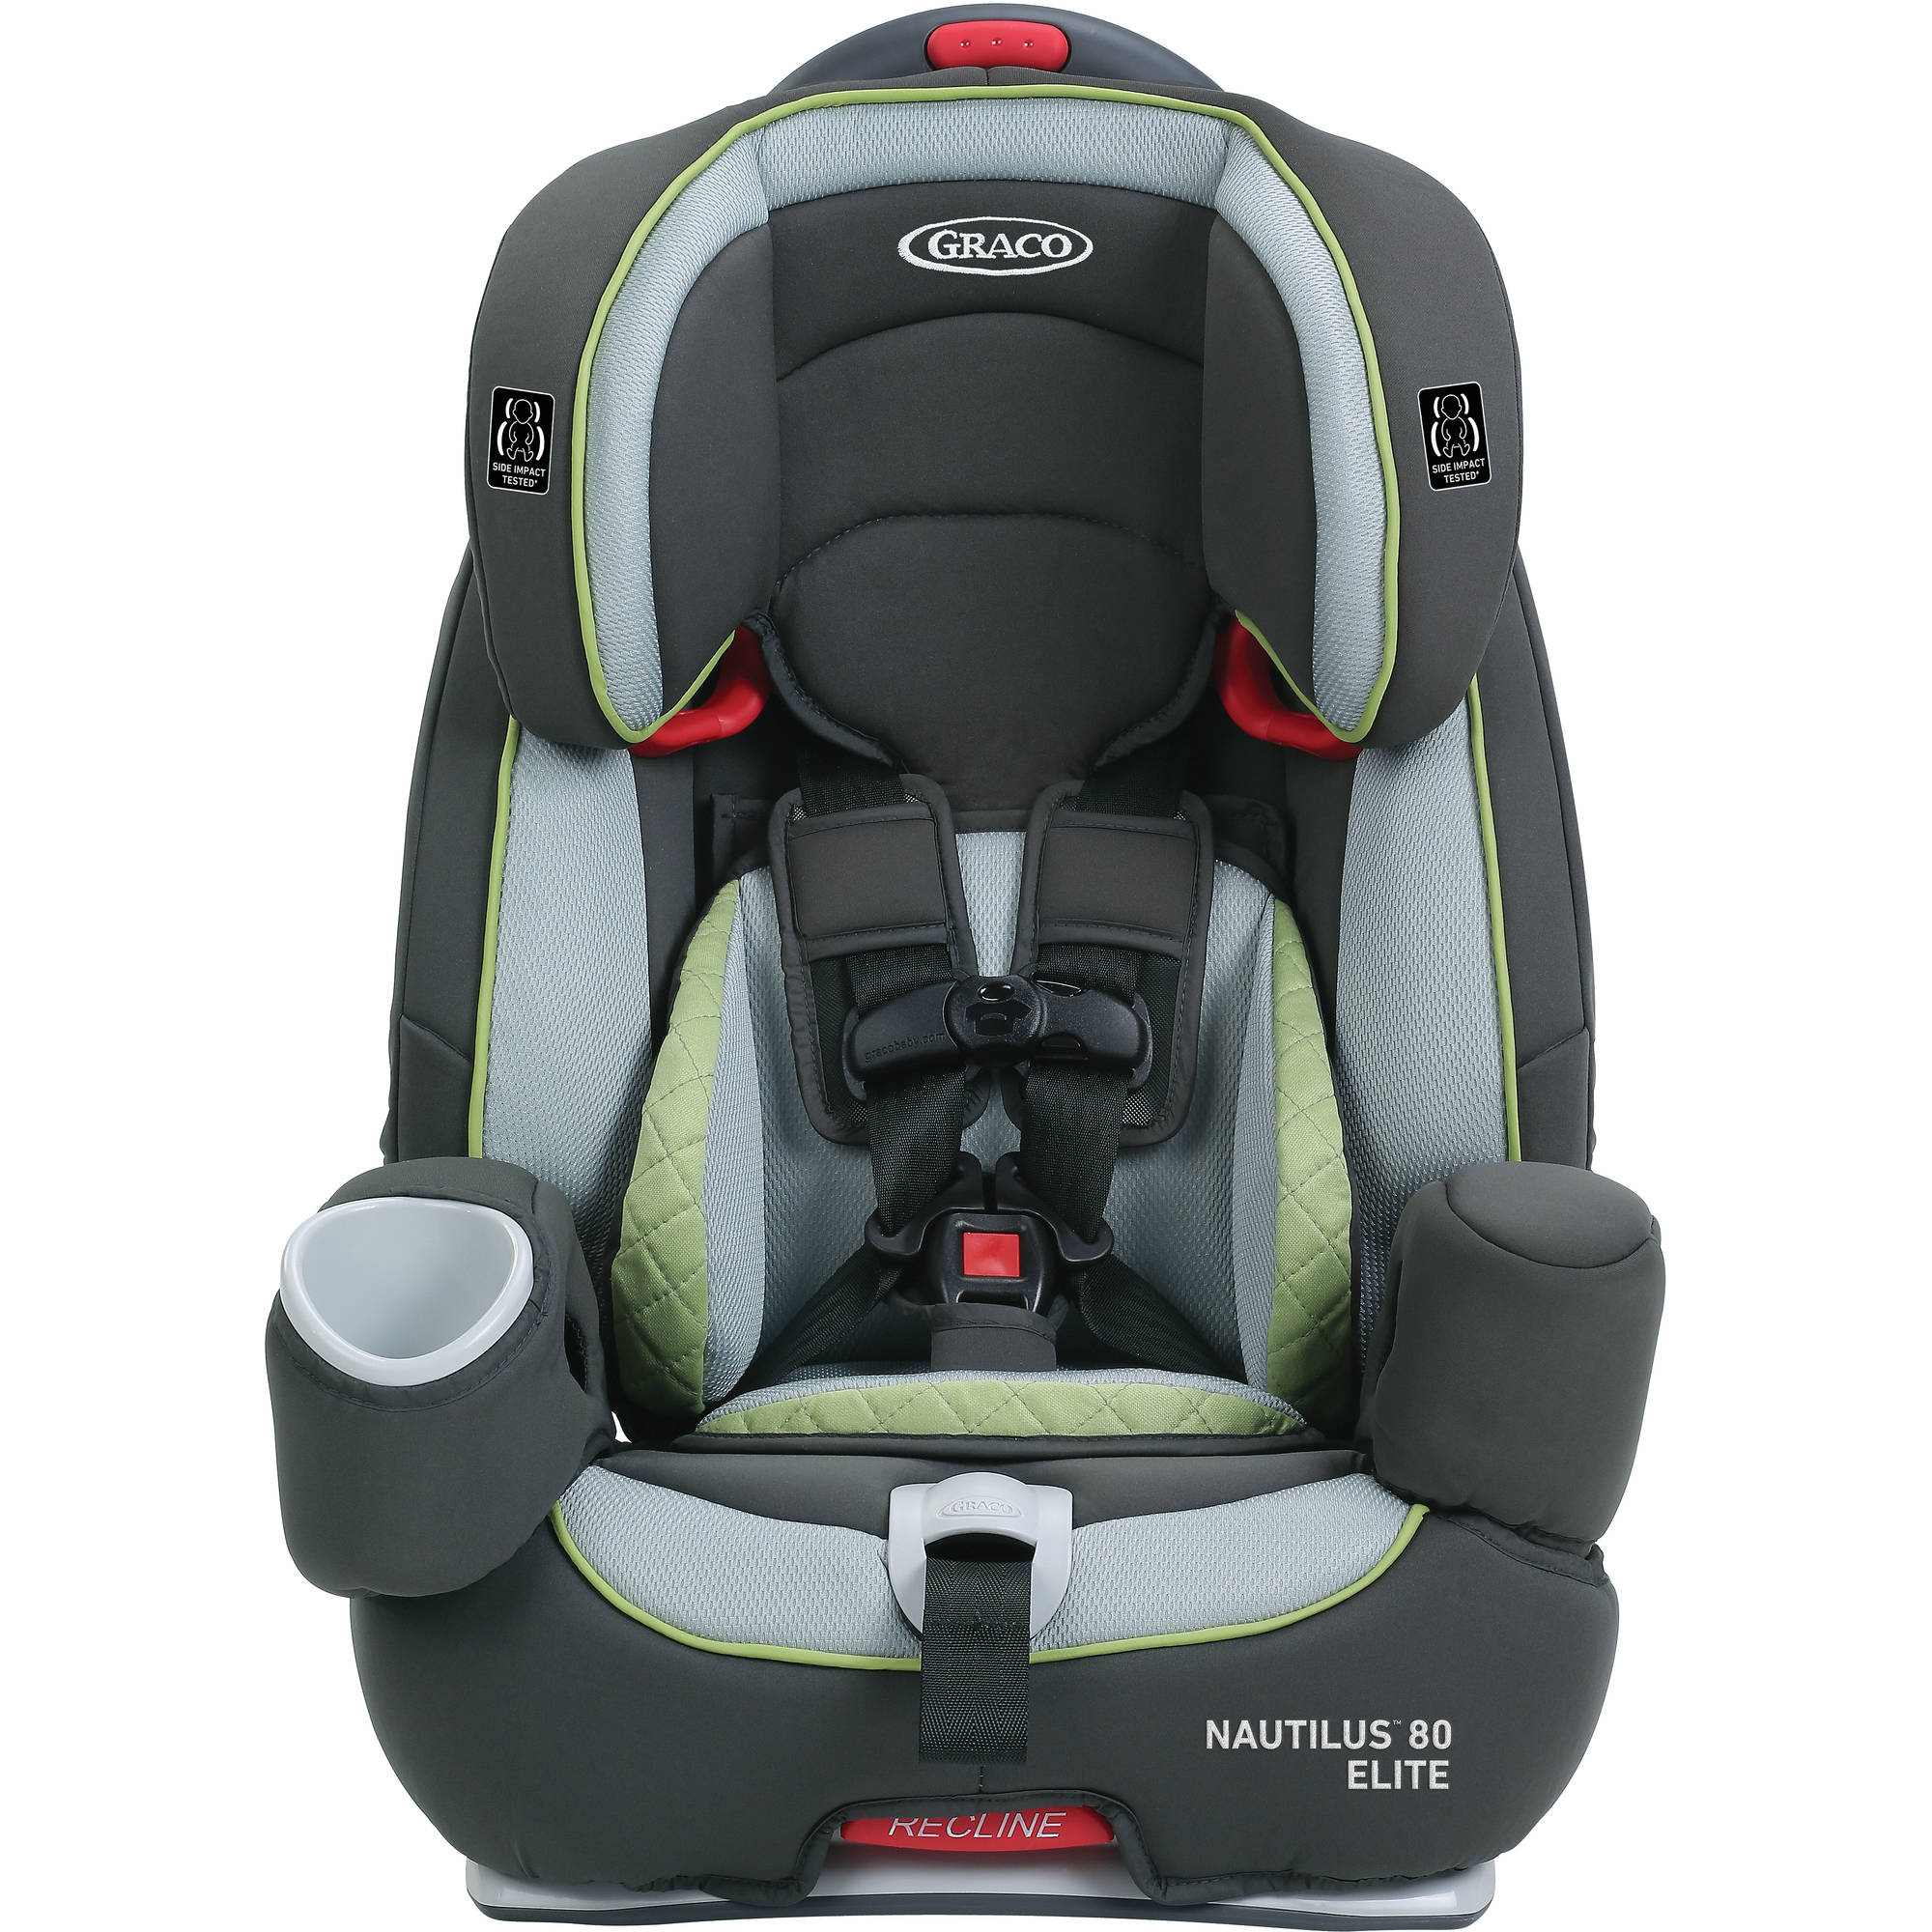 Graco nautilus 3 in 1 multi use car seat - Graco Nautilus 80 Elite 3 In 1 Harness Booster Car Seat Choose Your Color Walmart Com